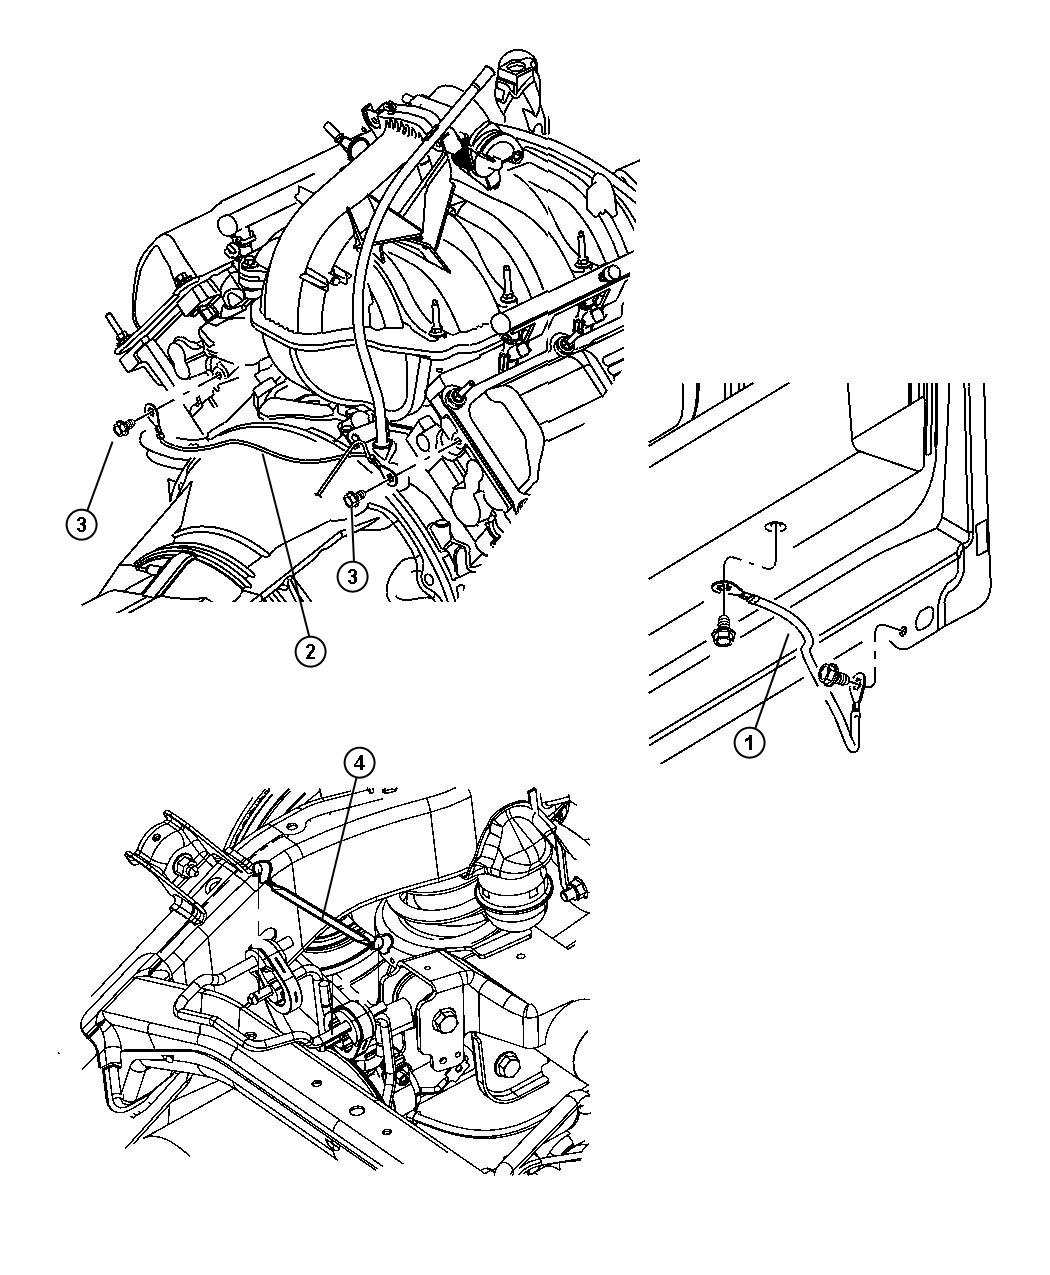 2013 Dodge Ram 1500 Strap. Ground. Frame to body, frame to